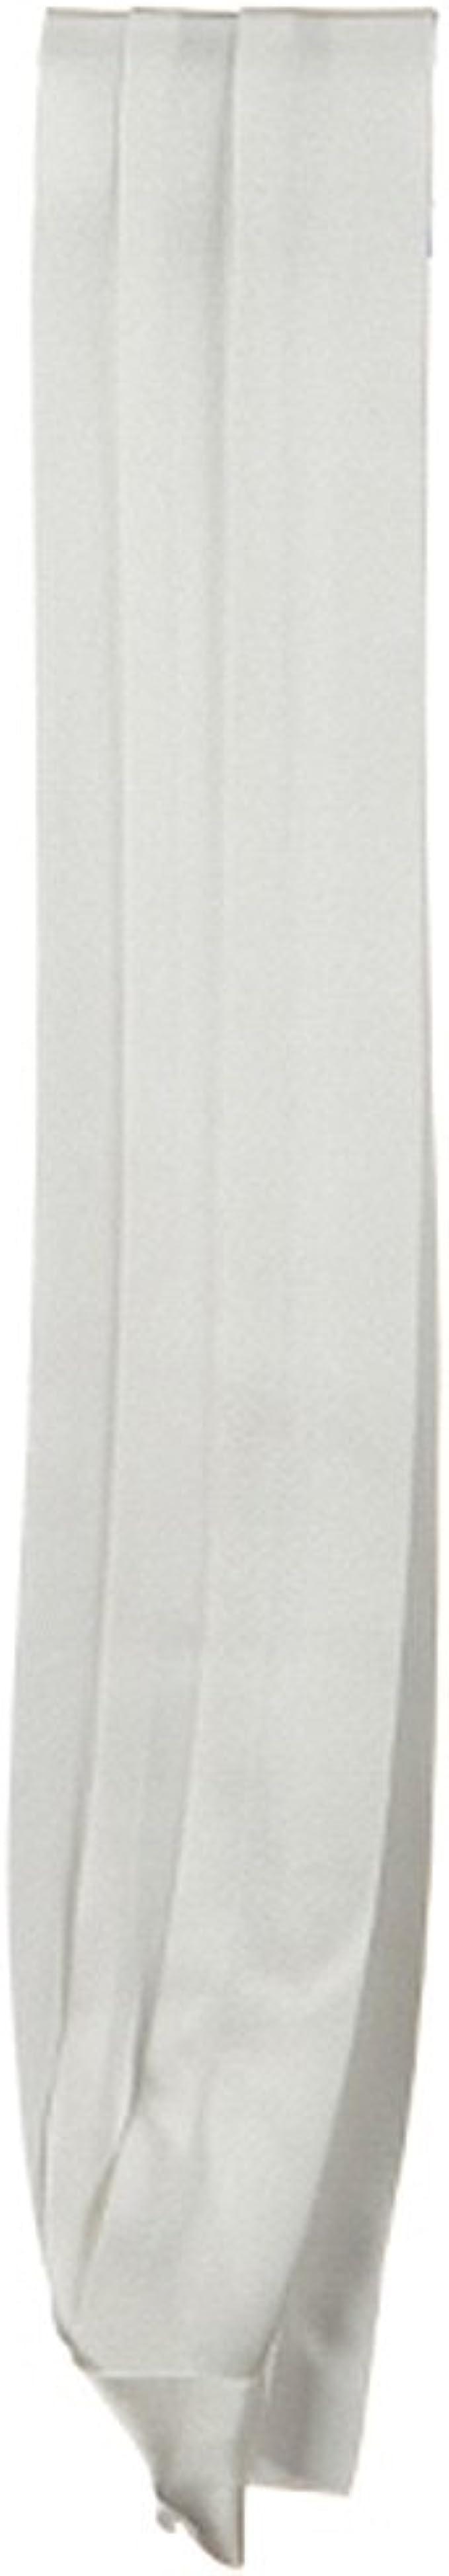 White DPC//Scalar Silk 3 Pleat Fashion Band